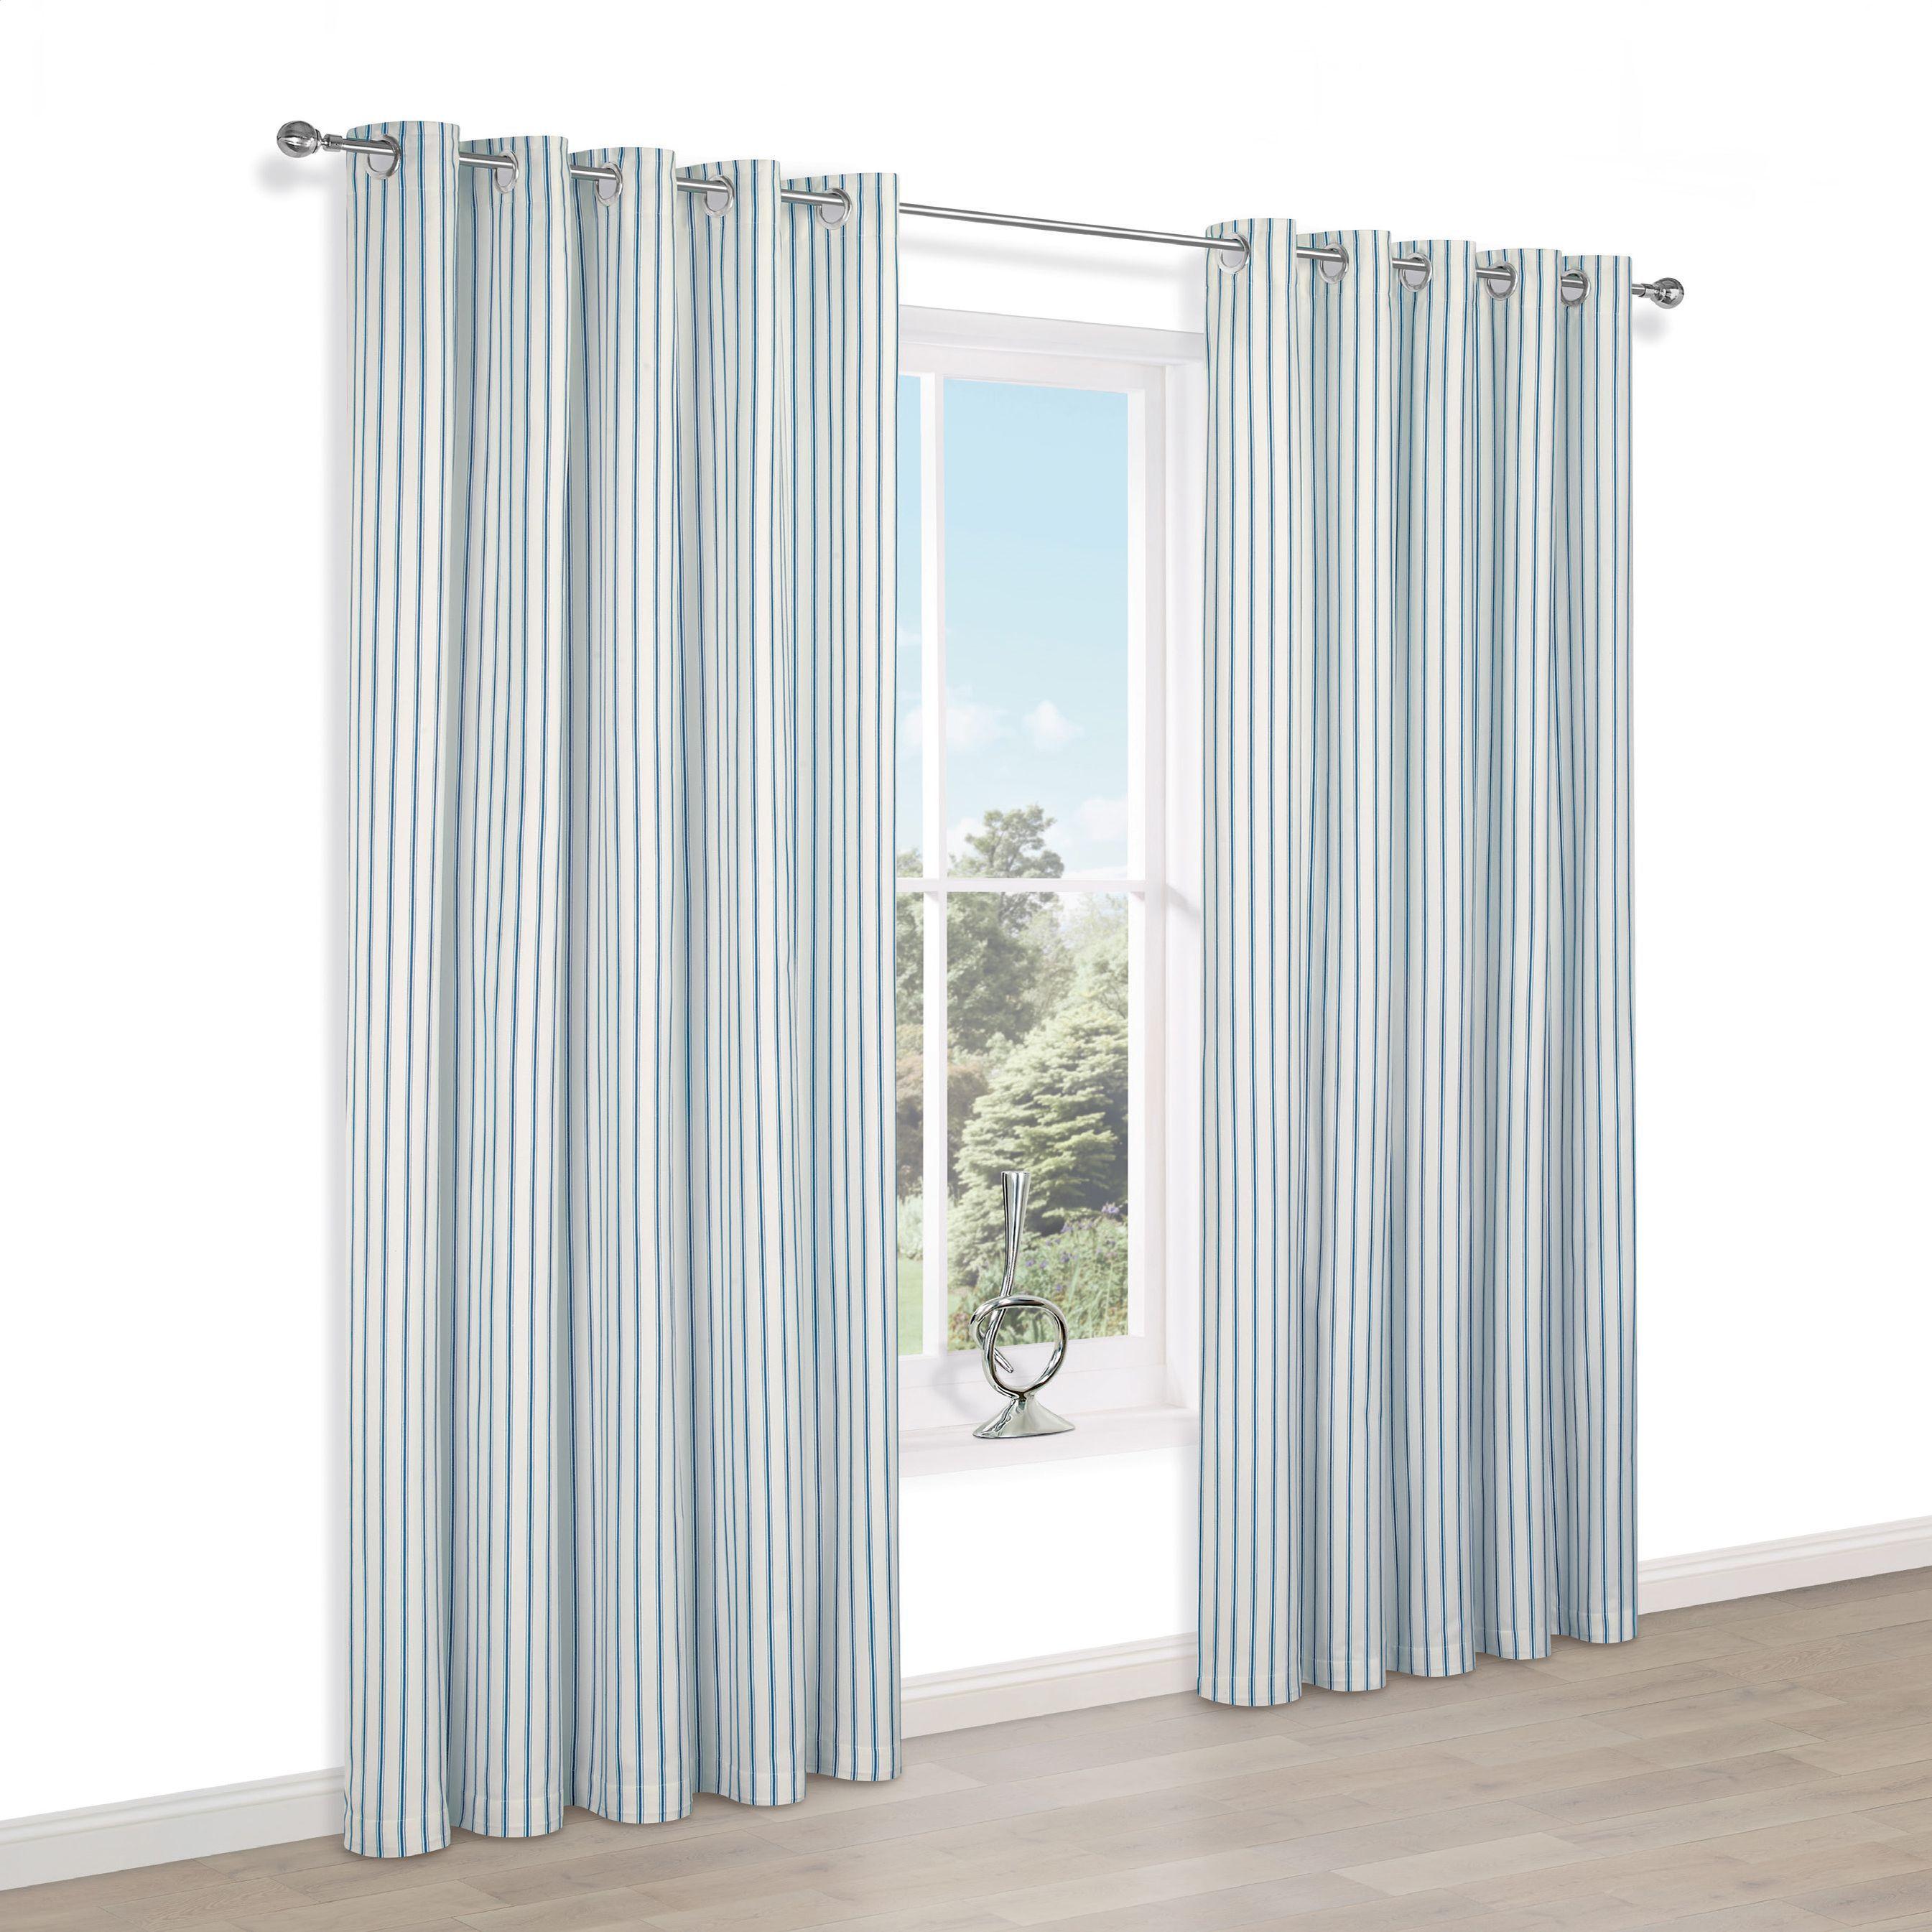 Christina Blue & White Stripe Eyelet Lined Curtains (w)167cm (l)183cm